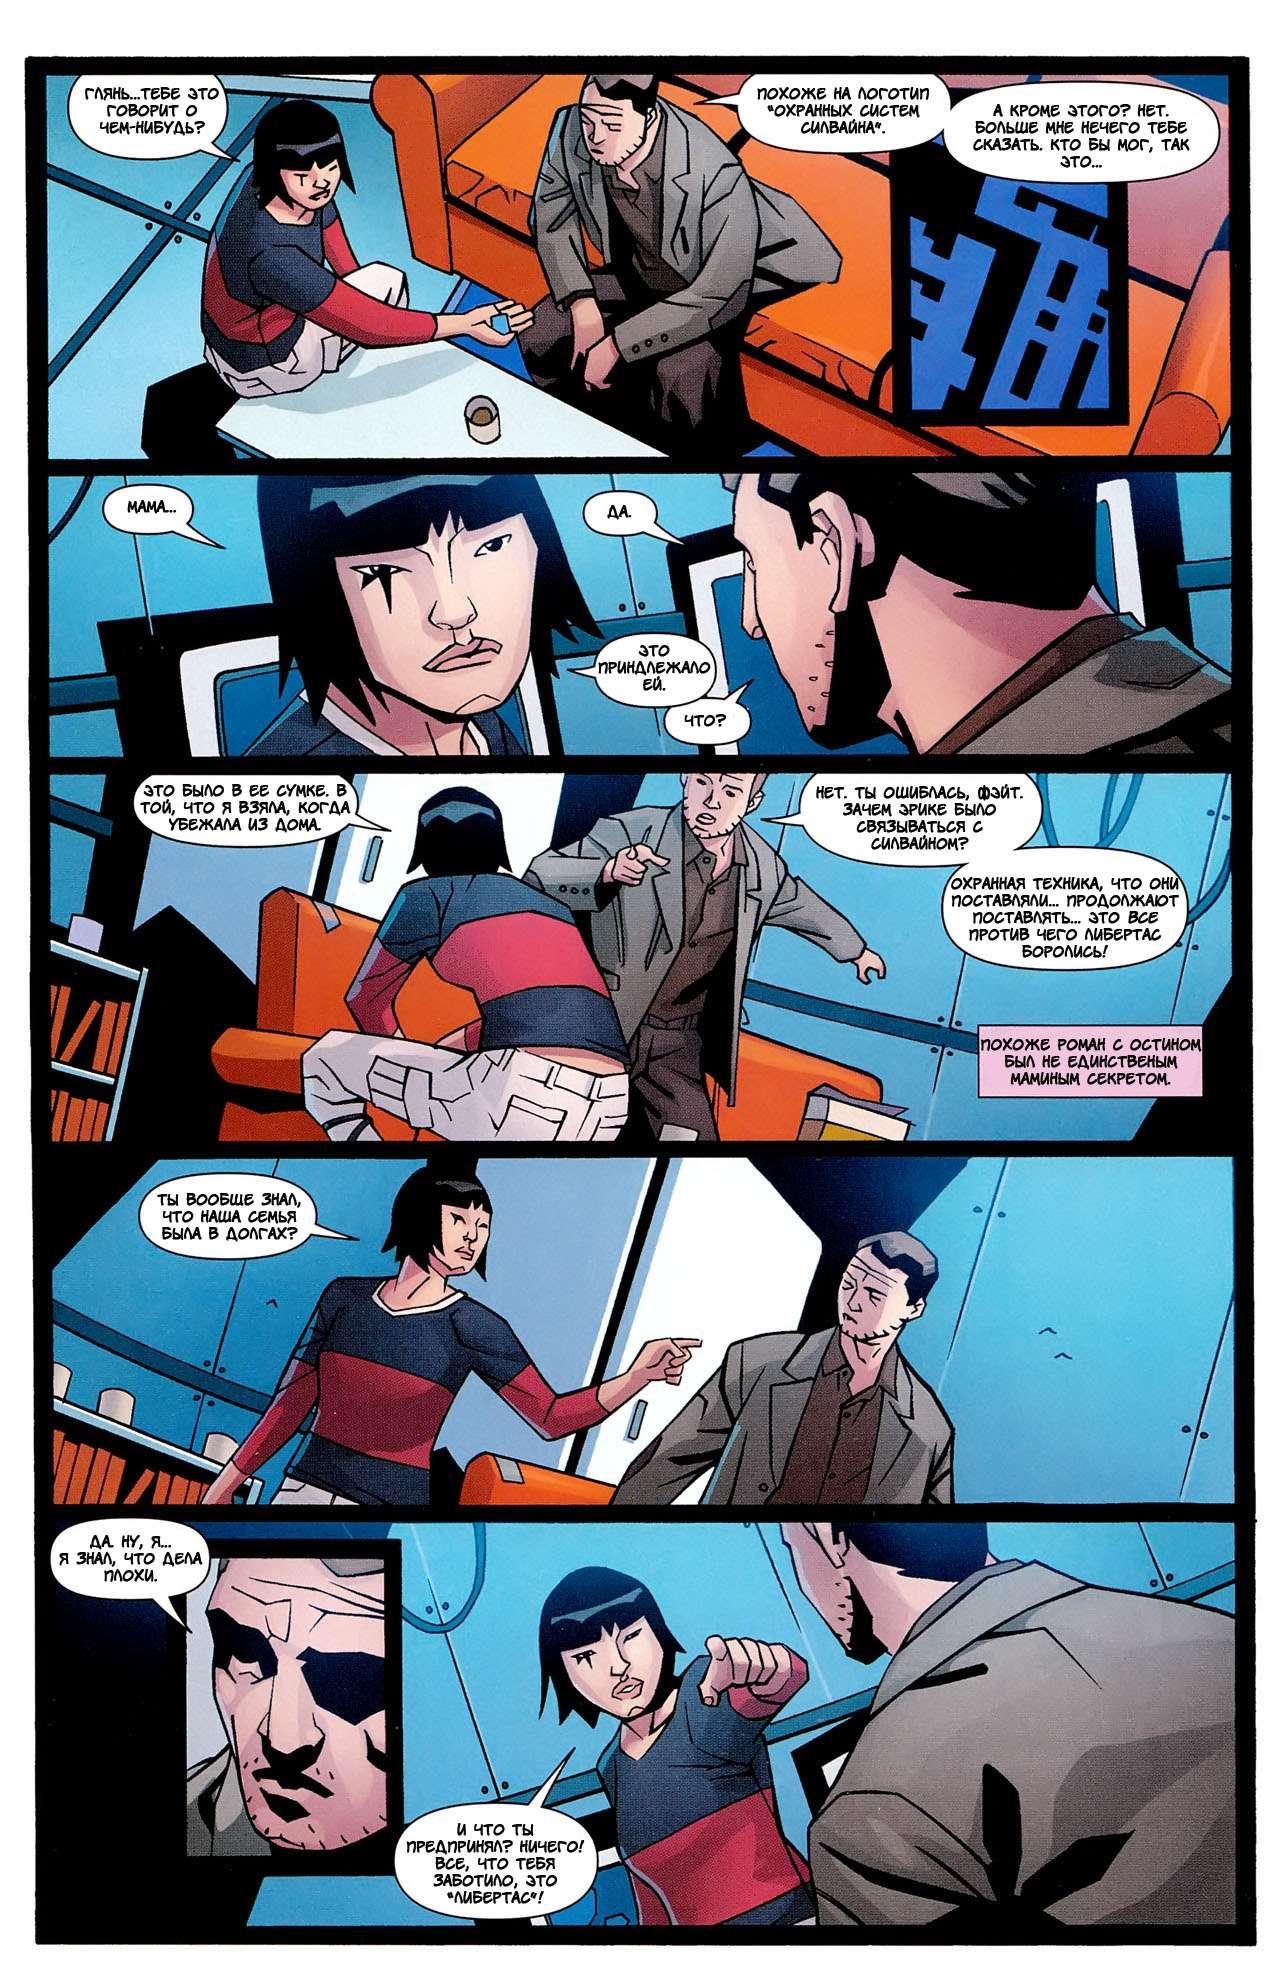 mirrors-edge-05-pg-10